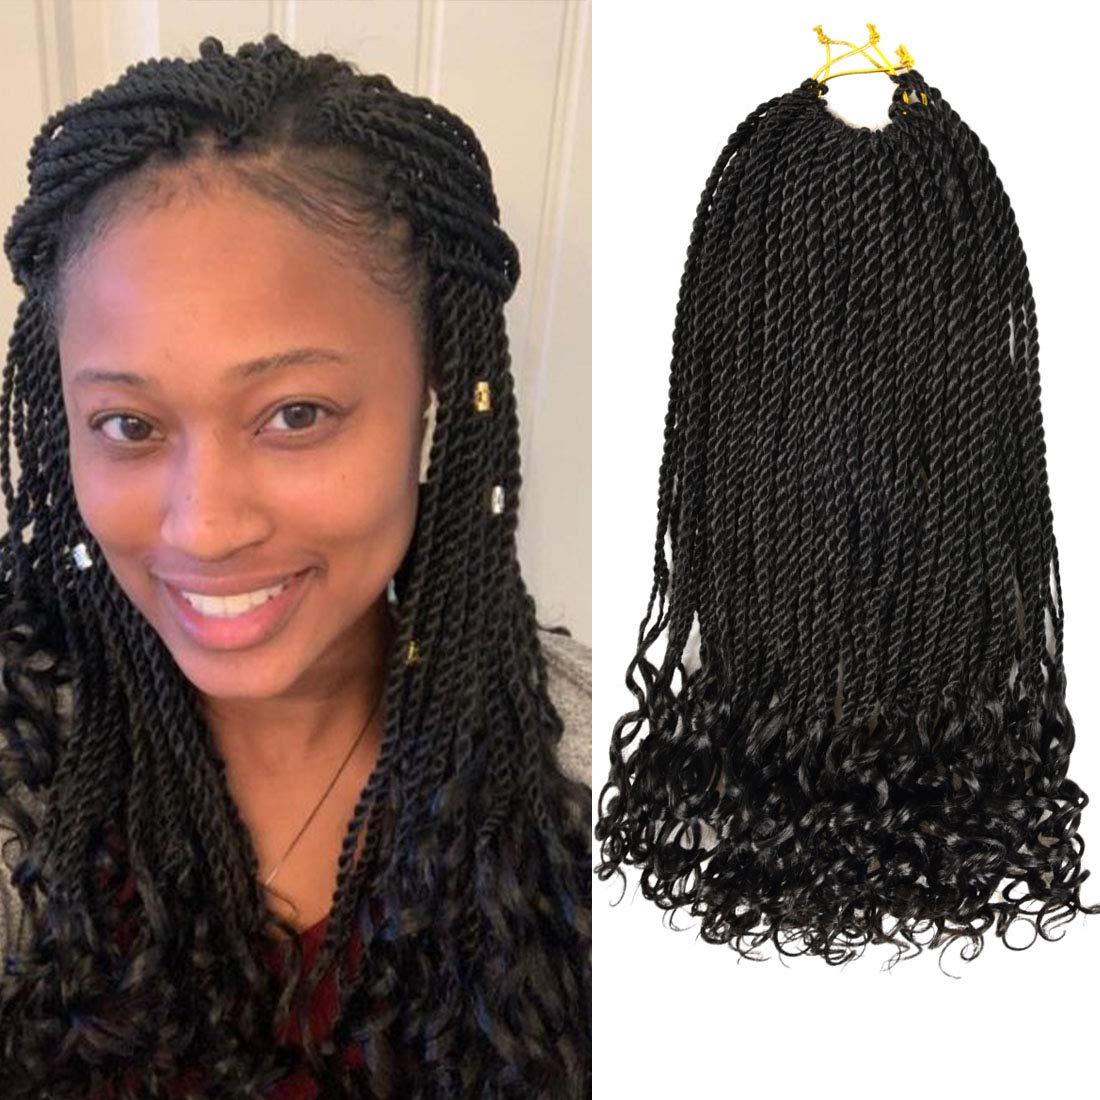 Senegalese Twist Hair Crochet Braids Curly Wave 18 Inch 6 Packs 30 Strands/Pack Braiding Hair Crochet Curly Braid Hair Extension(1B)